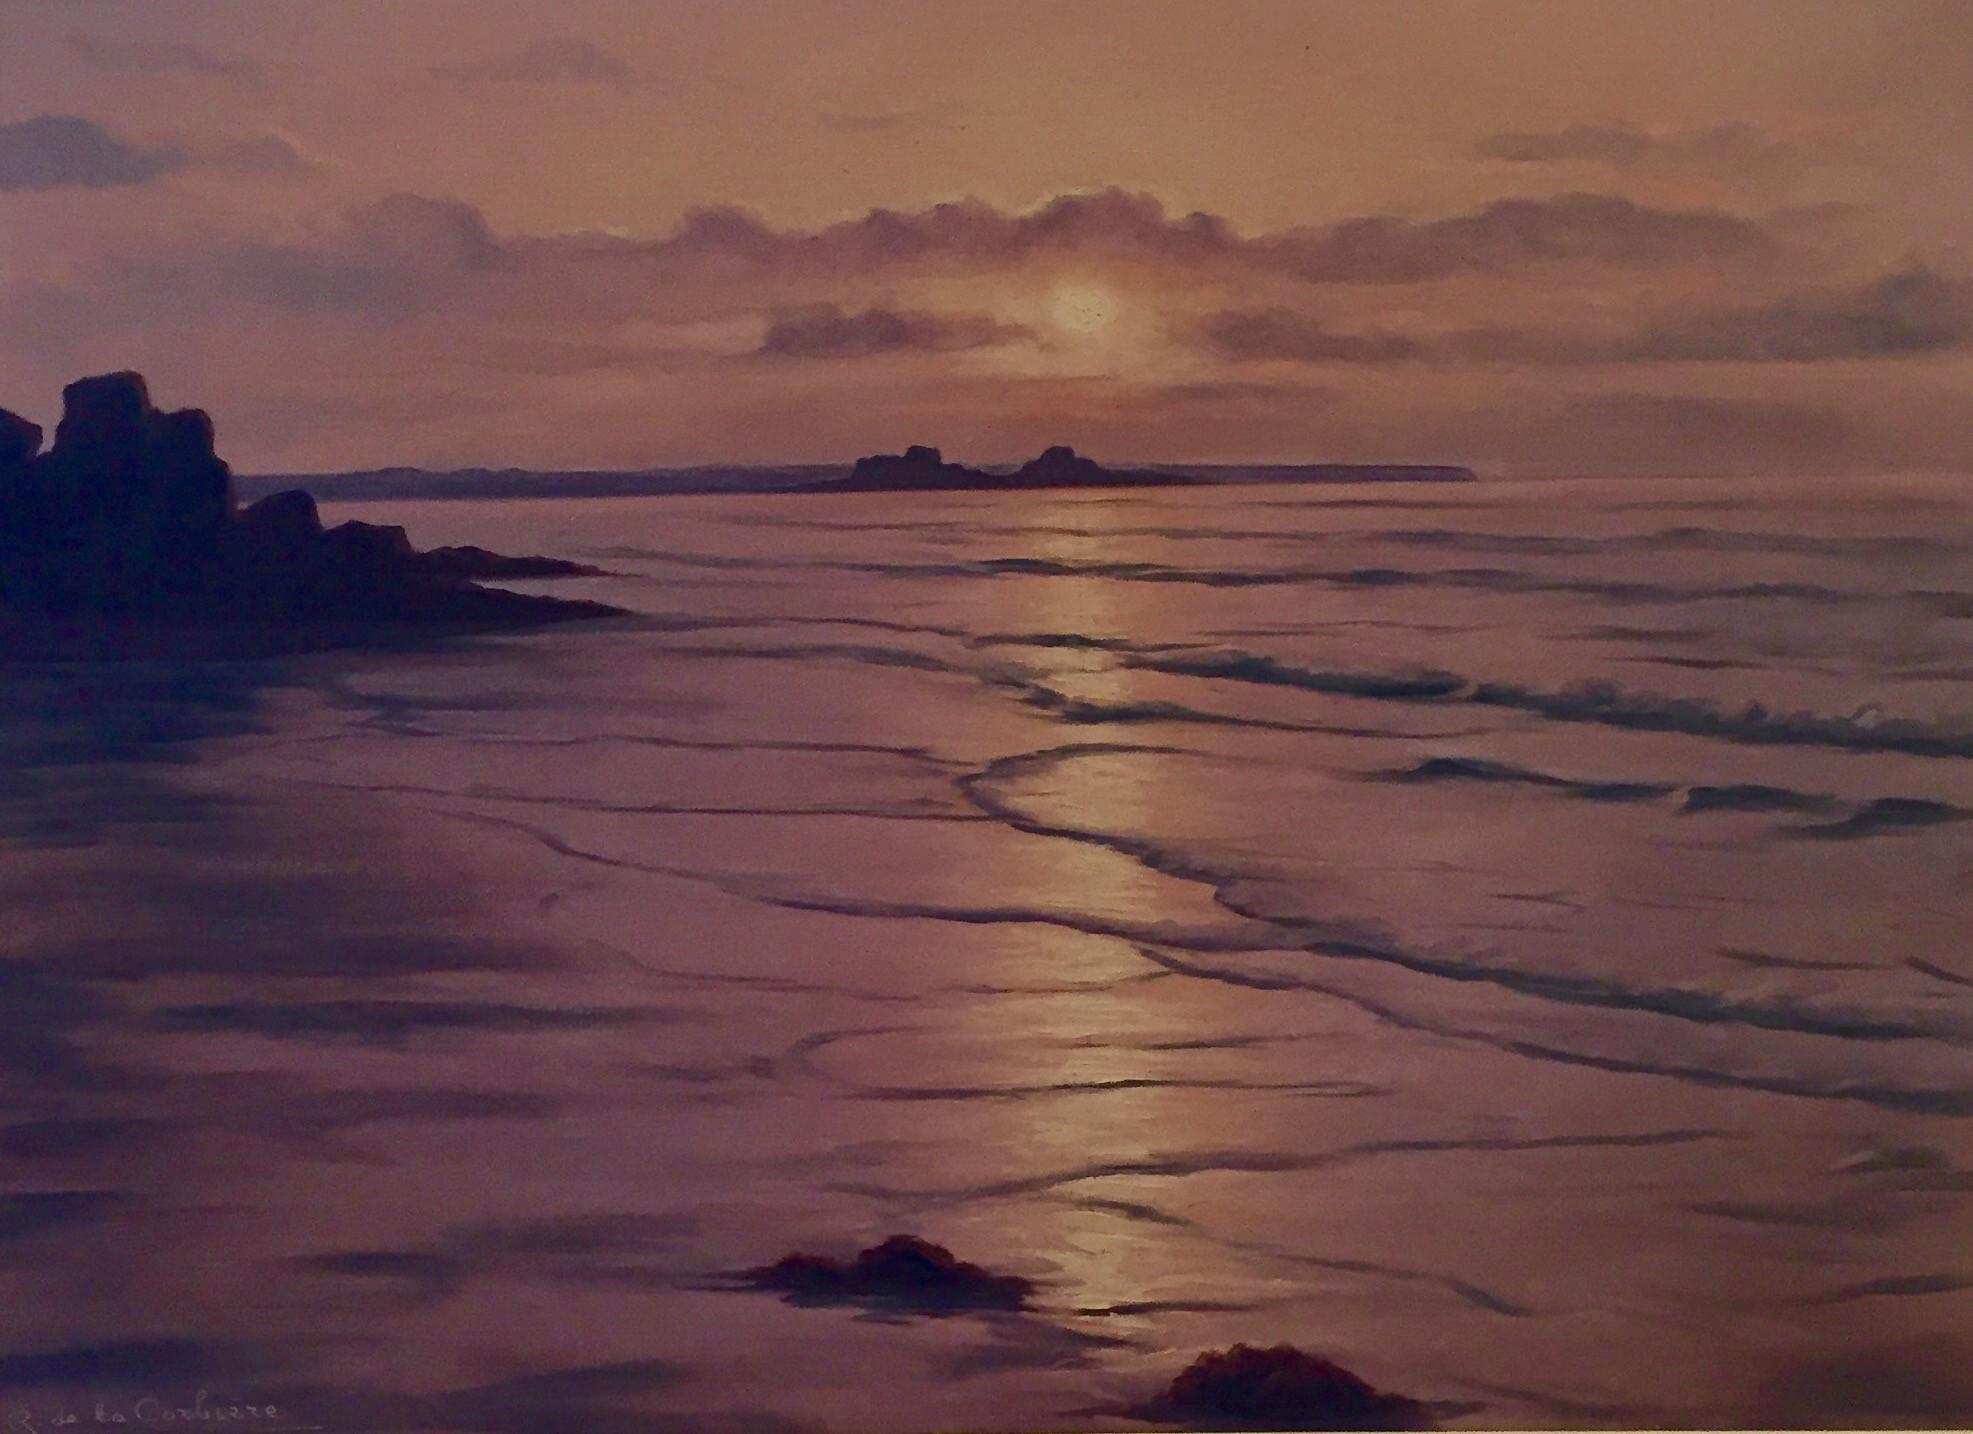 Moonlit Coastal Scene